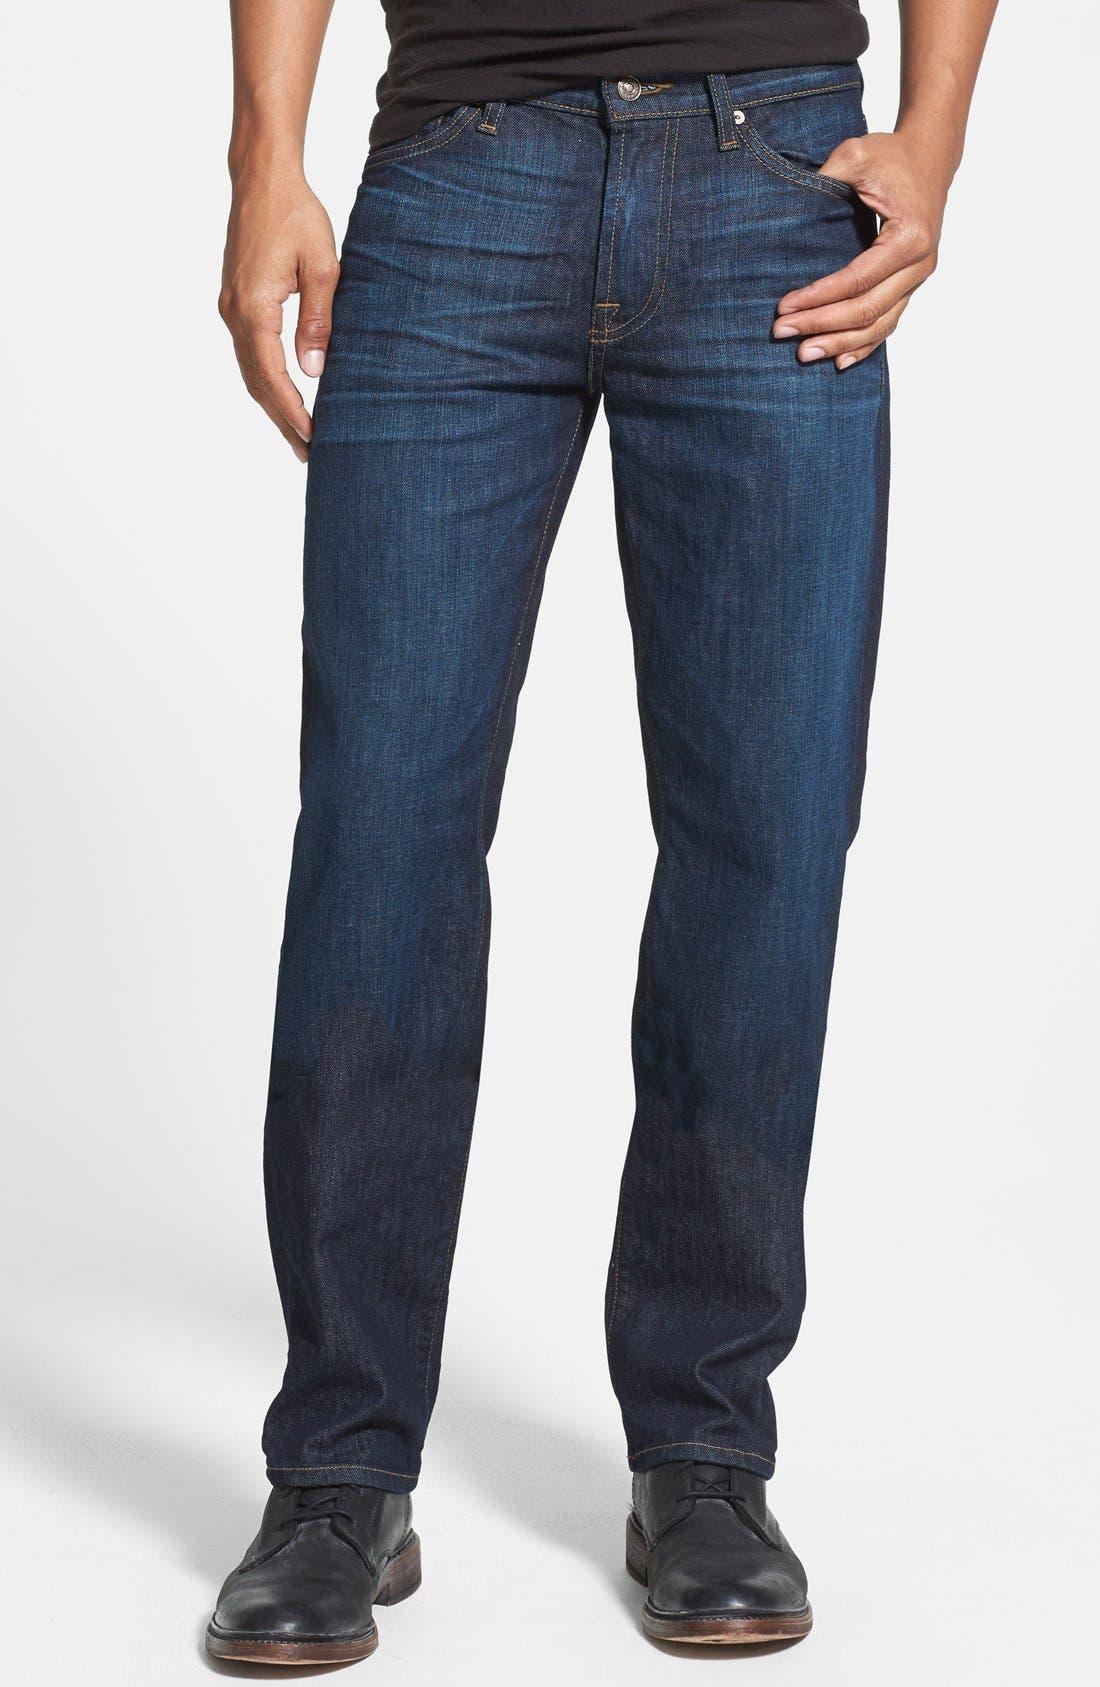 Alternate Image 1 Selected - 7 For All Mankind® 'Slimmy' Slim Straight Leg Jeans (Monaco Blue)